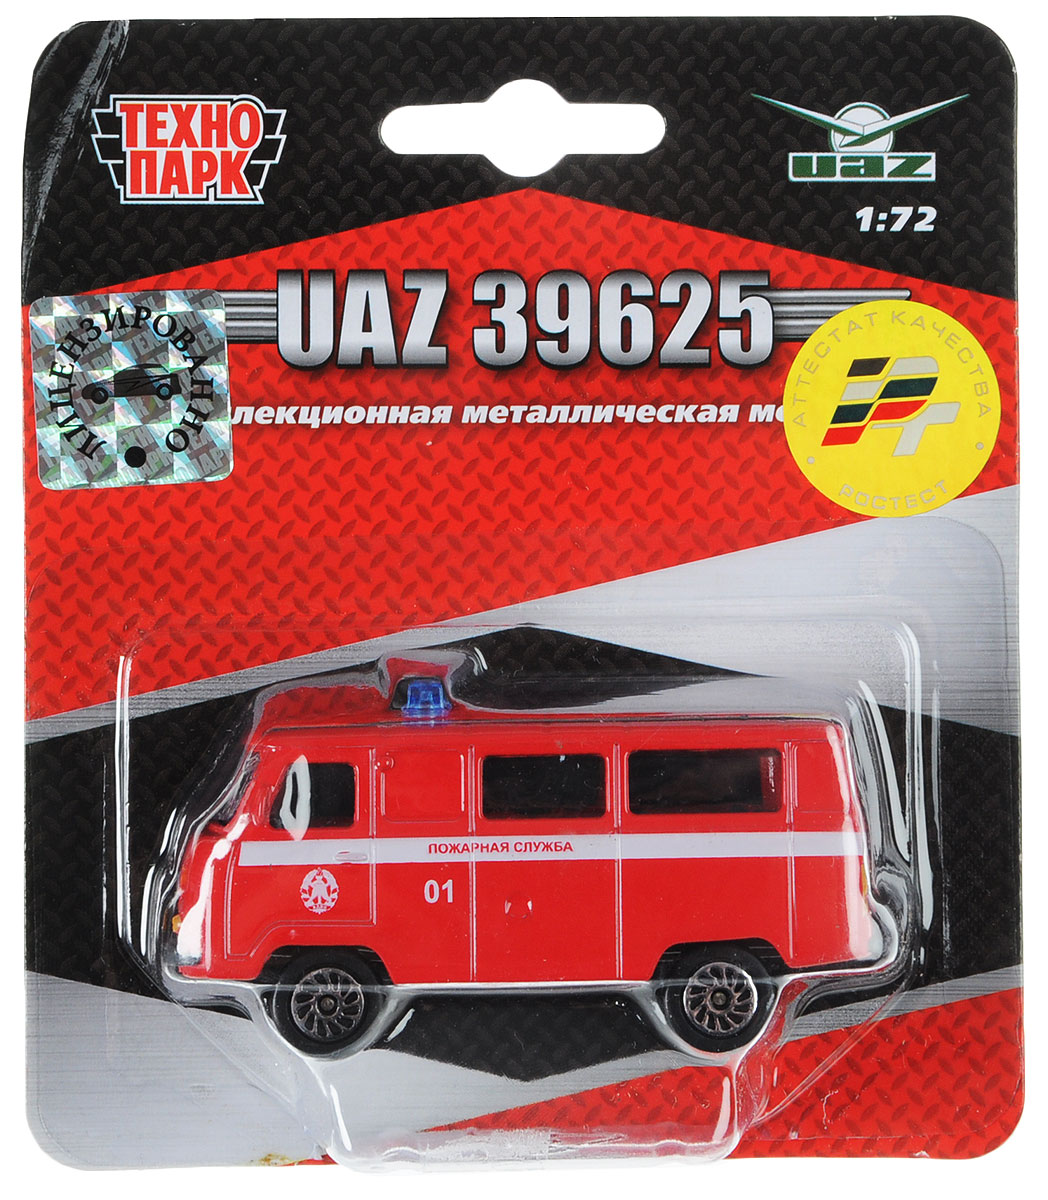 ТехноПарк Автомобиль UAZ 39625 Пожарная служба фарк��п avtos на уаз 2206 3741 3909 3962 39625 3963 тип крюка a г в н 750 50кг uaz 07